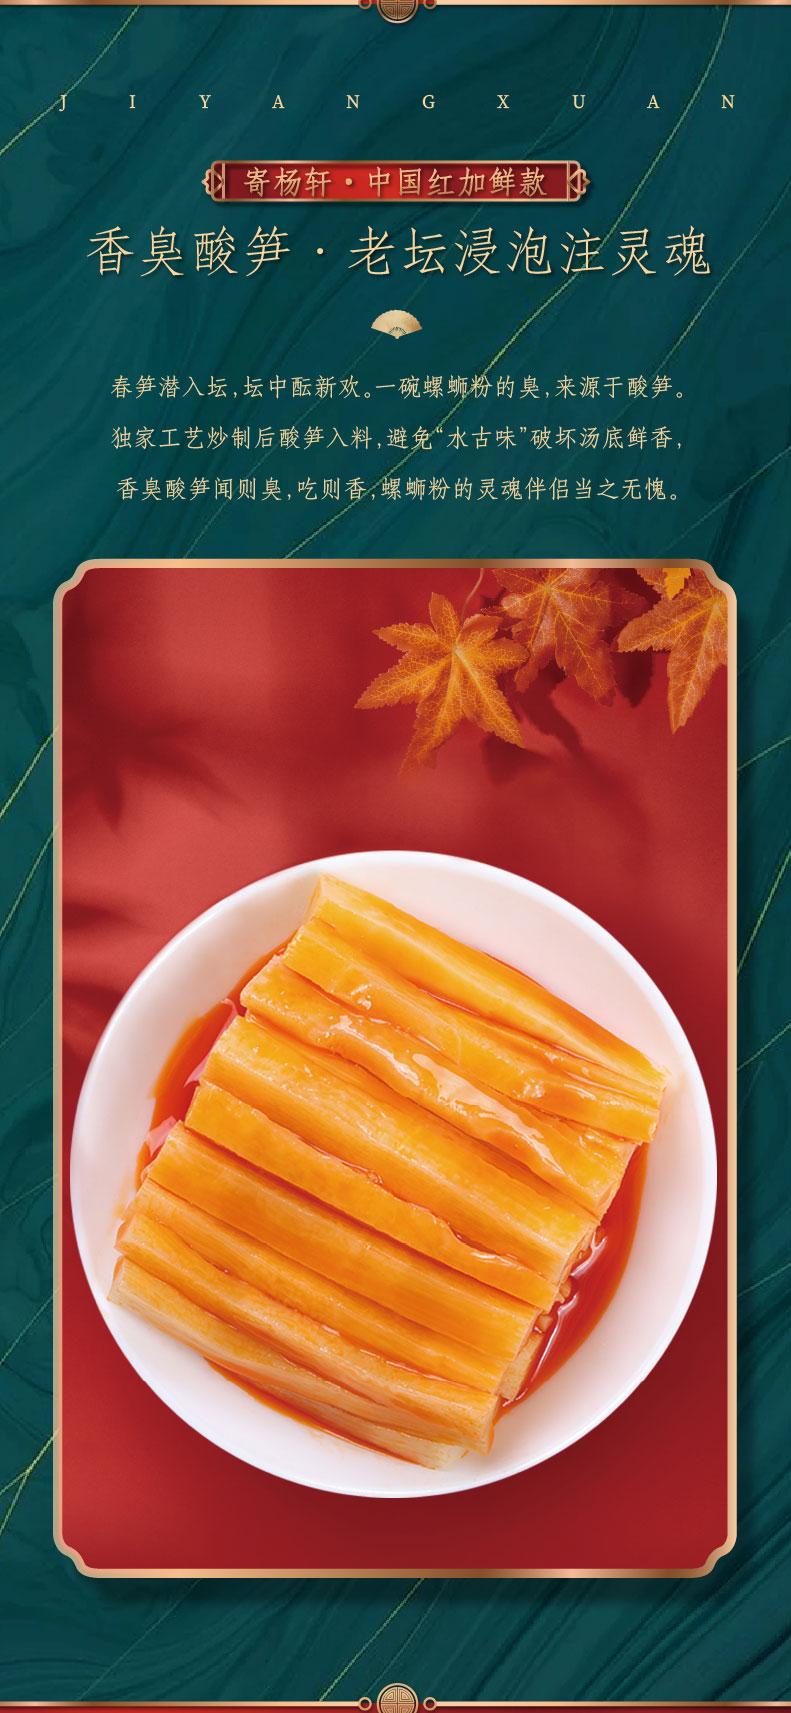 product_奇妙_寄杨轩螺蛳粉